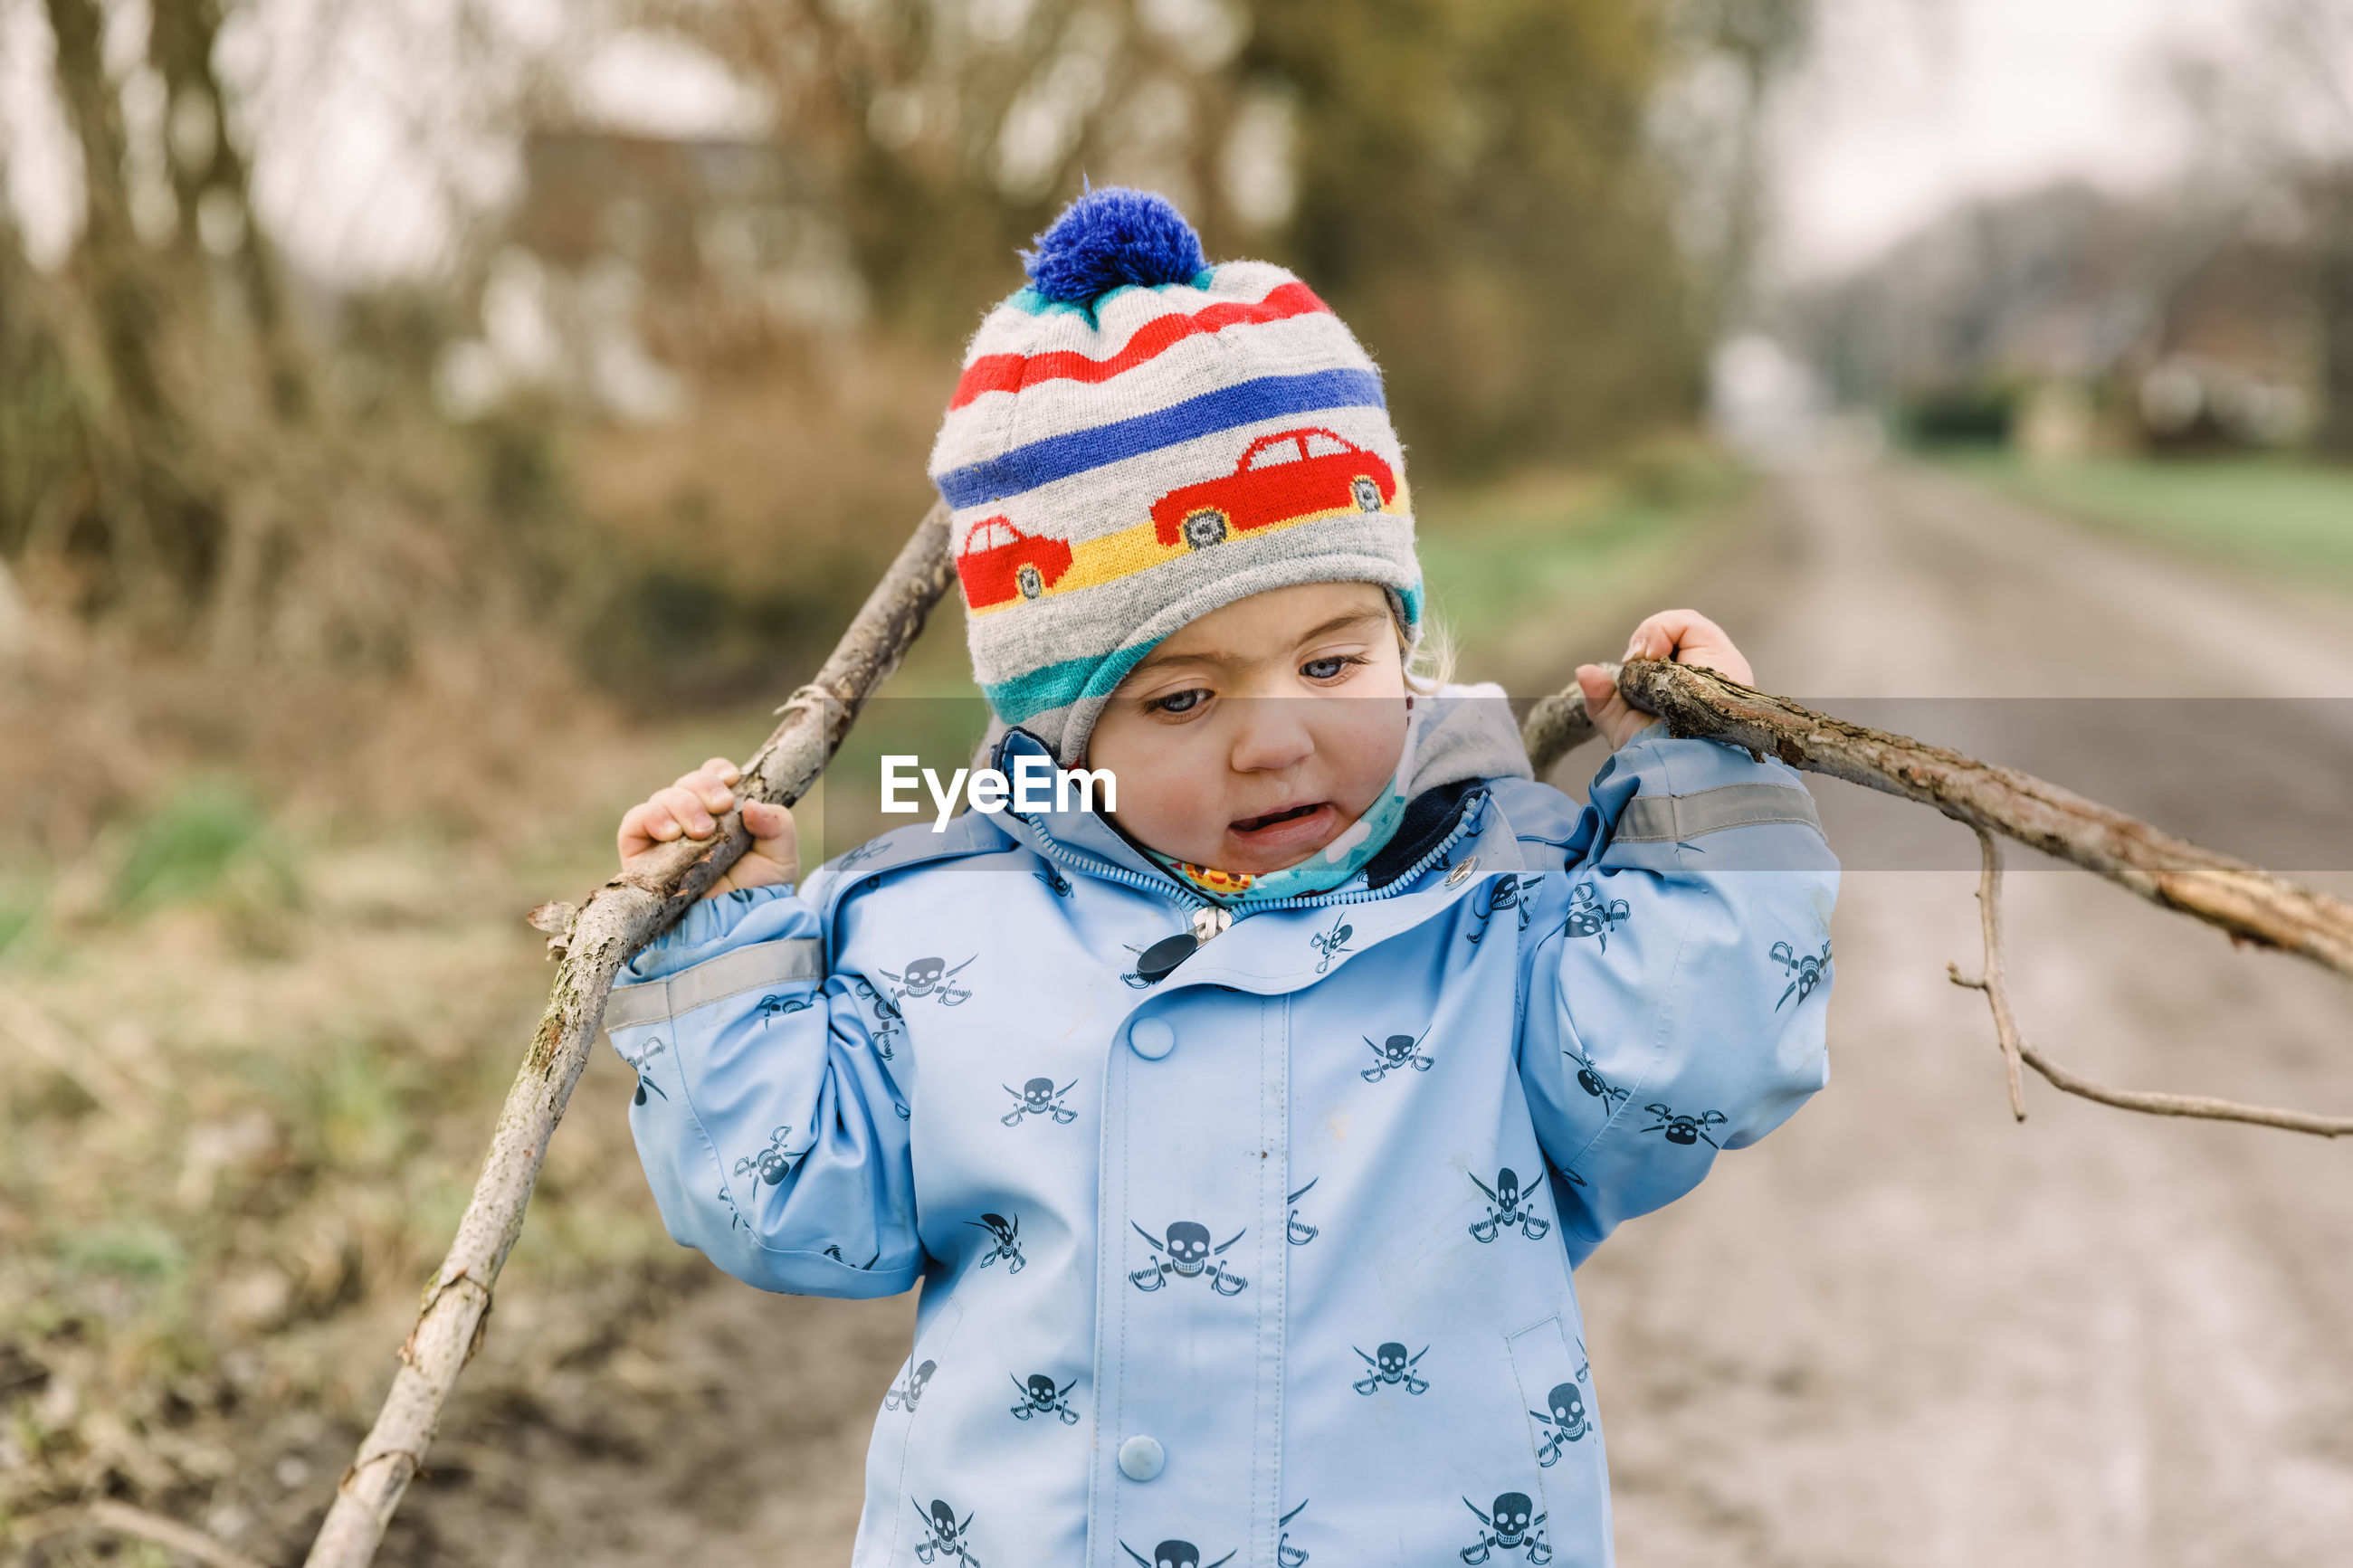 Cute girl wearing warm clothing holding sticks